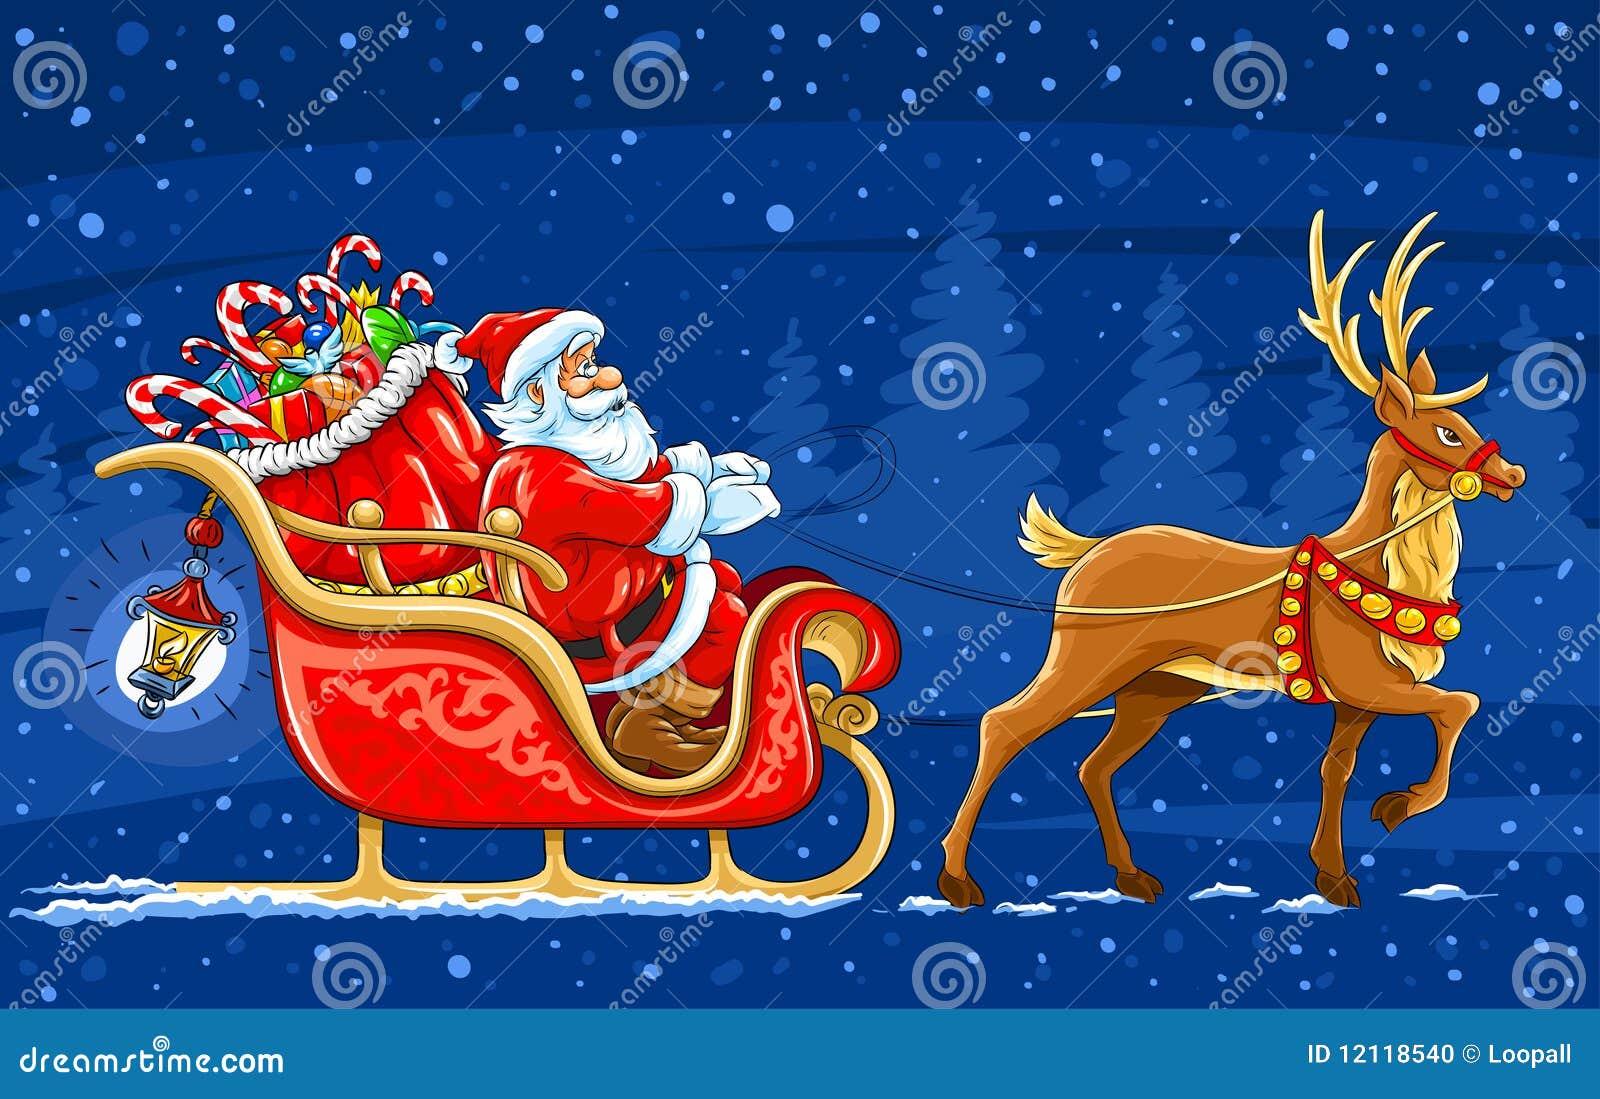 Wonderbaar De Kerstman Die Zich Op De Slee Met Rendier Beweegt Stock RI-71